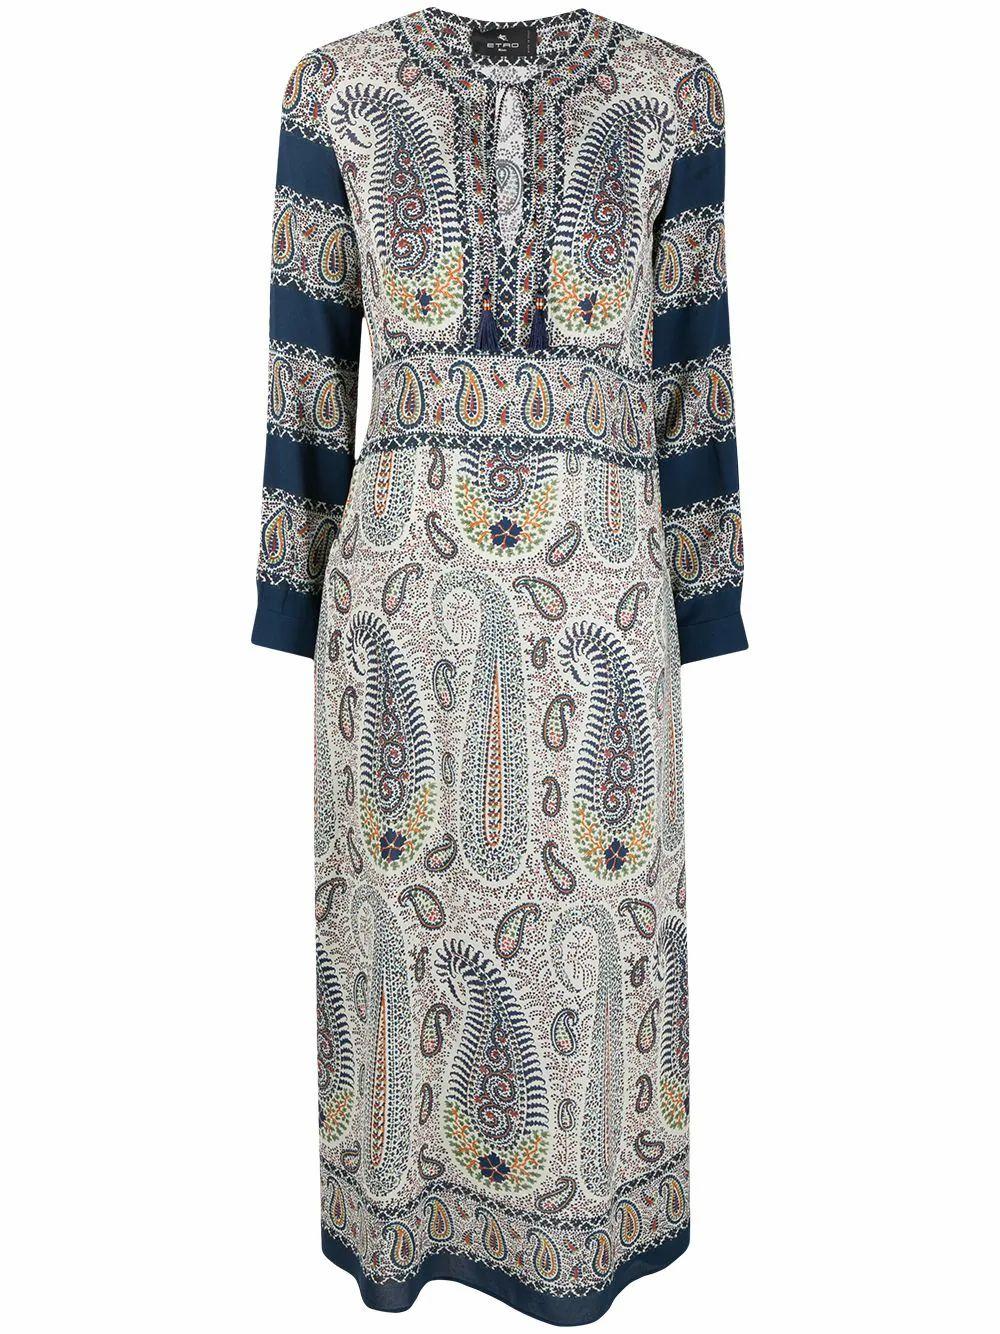 Etro Dresses ETRO WOMEN'S BLUE VISCOSE DRESS